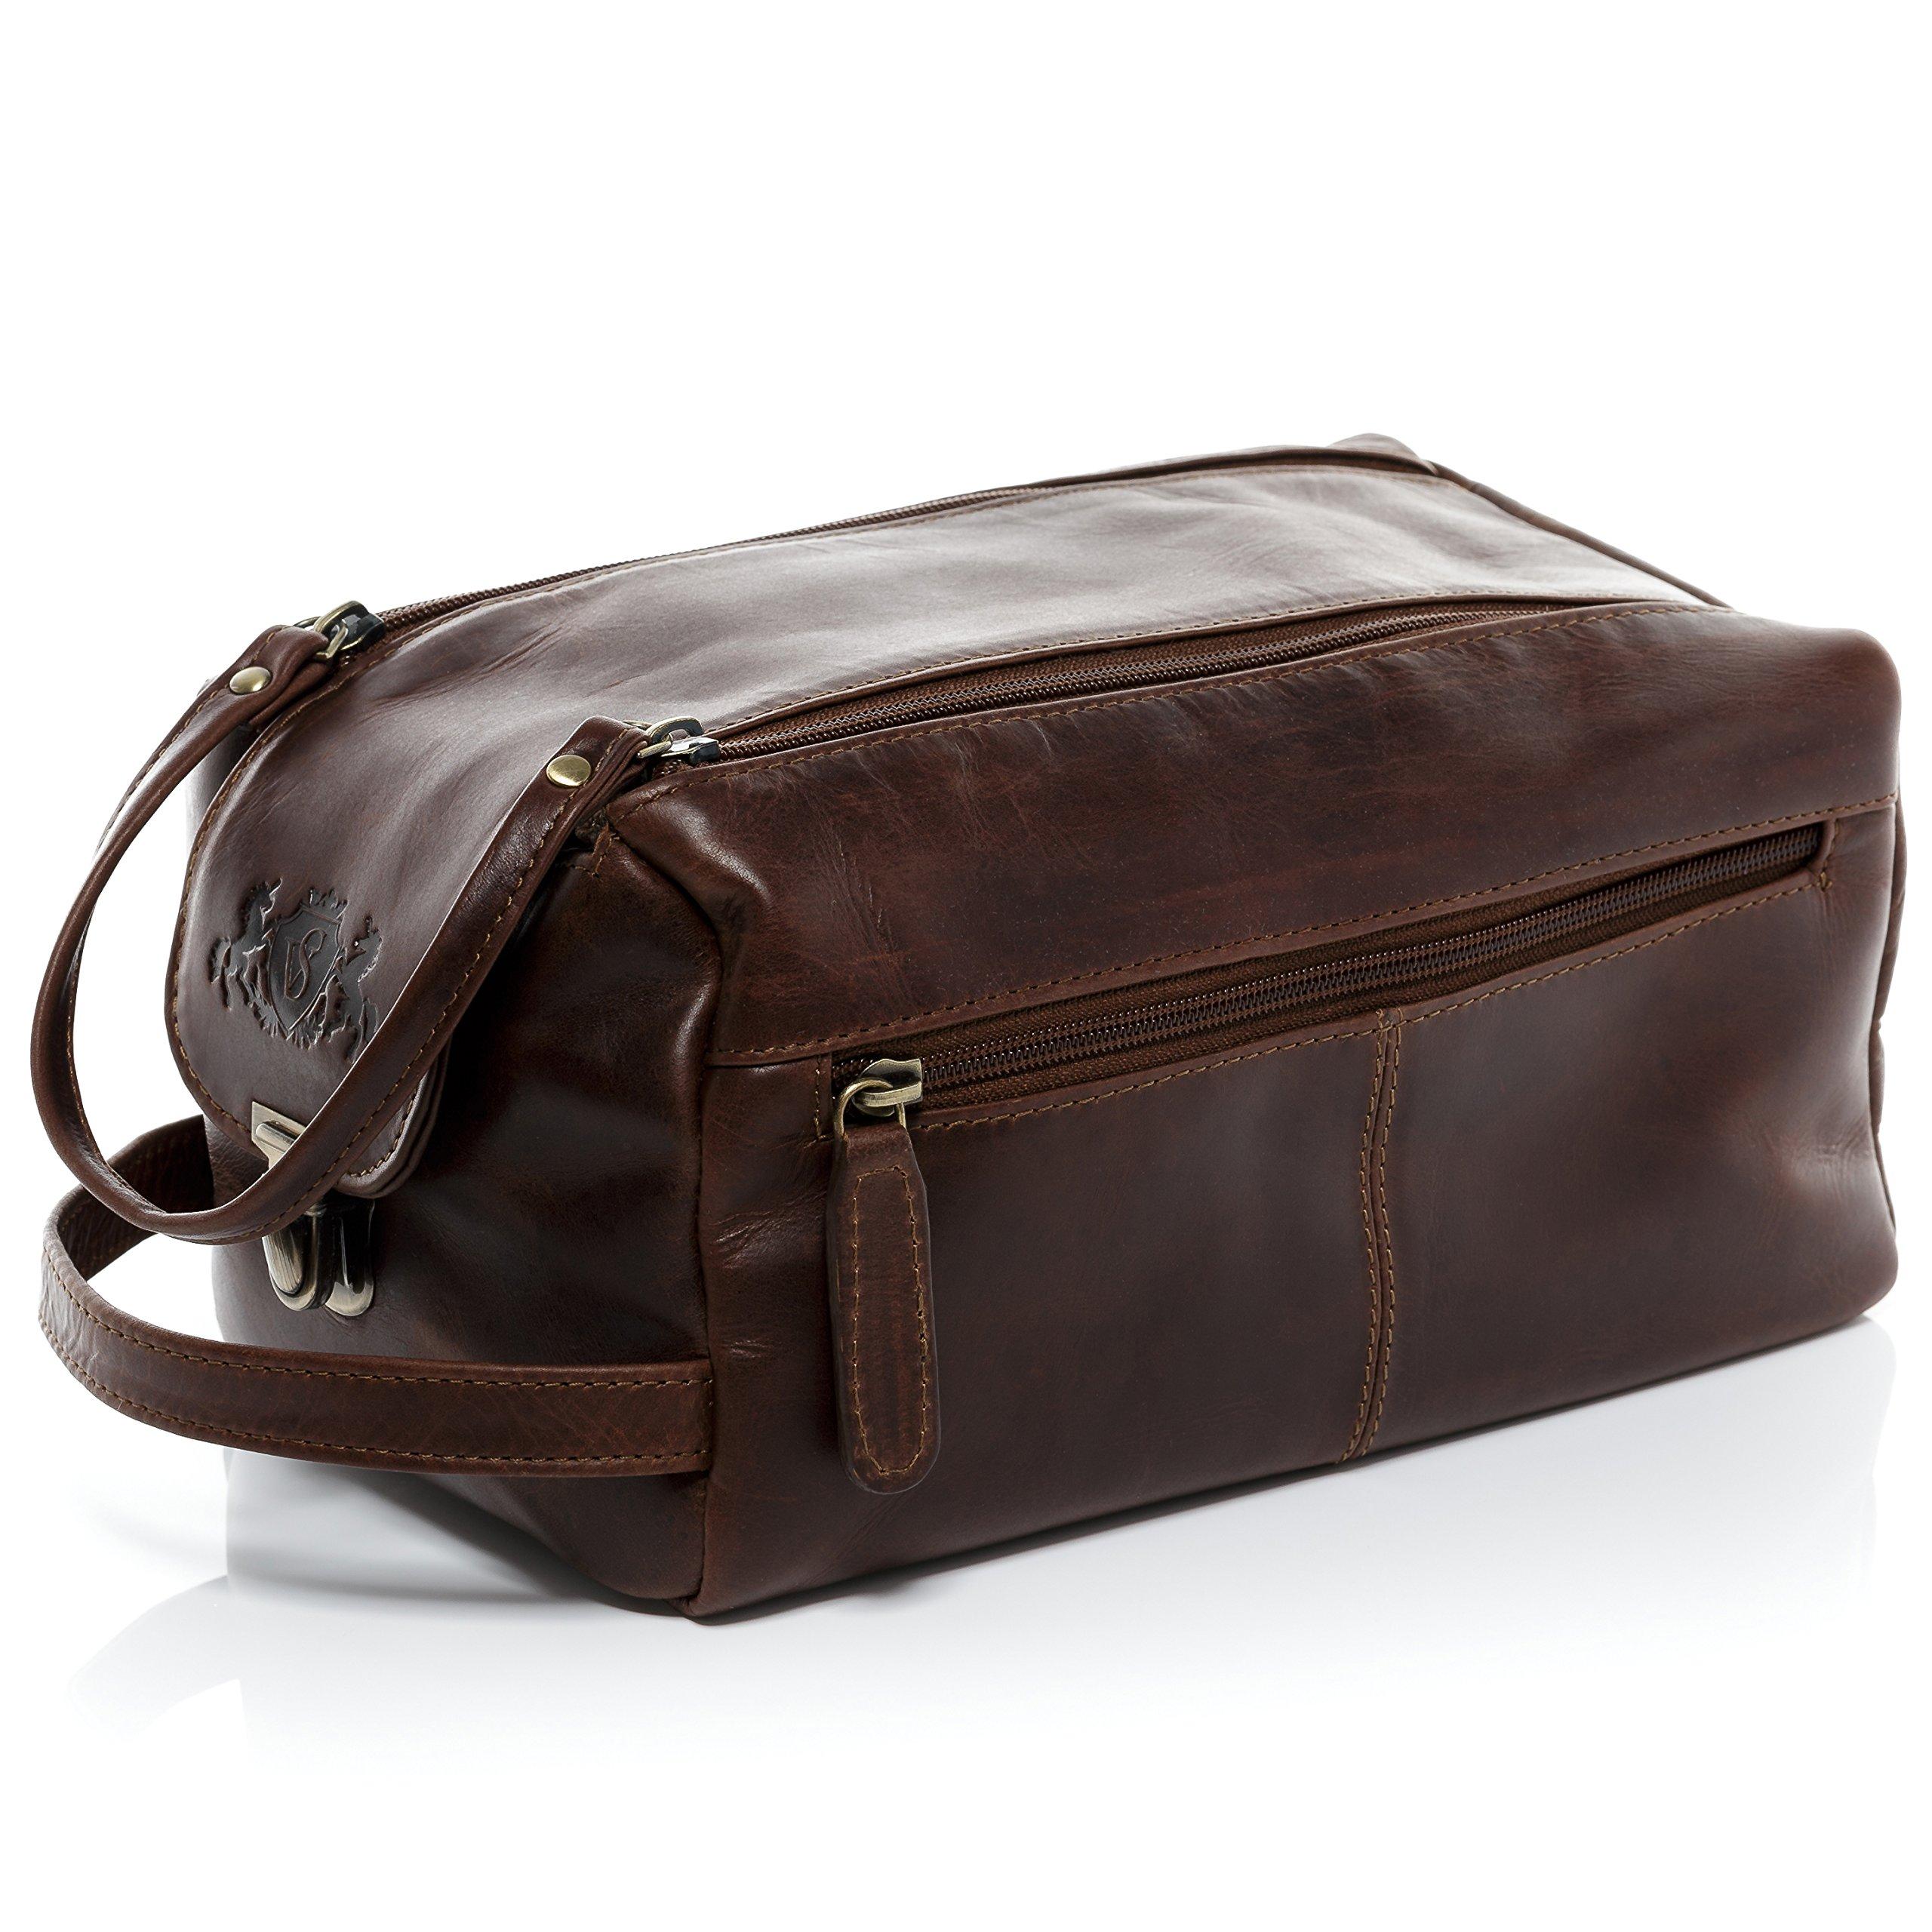 SID & VAIN Real Leather wash Bag Bristol XL Large Travel Overnight Wash Gym Shaving Bag for Men's or Ladies Toiletry Bag Women Men Brown